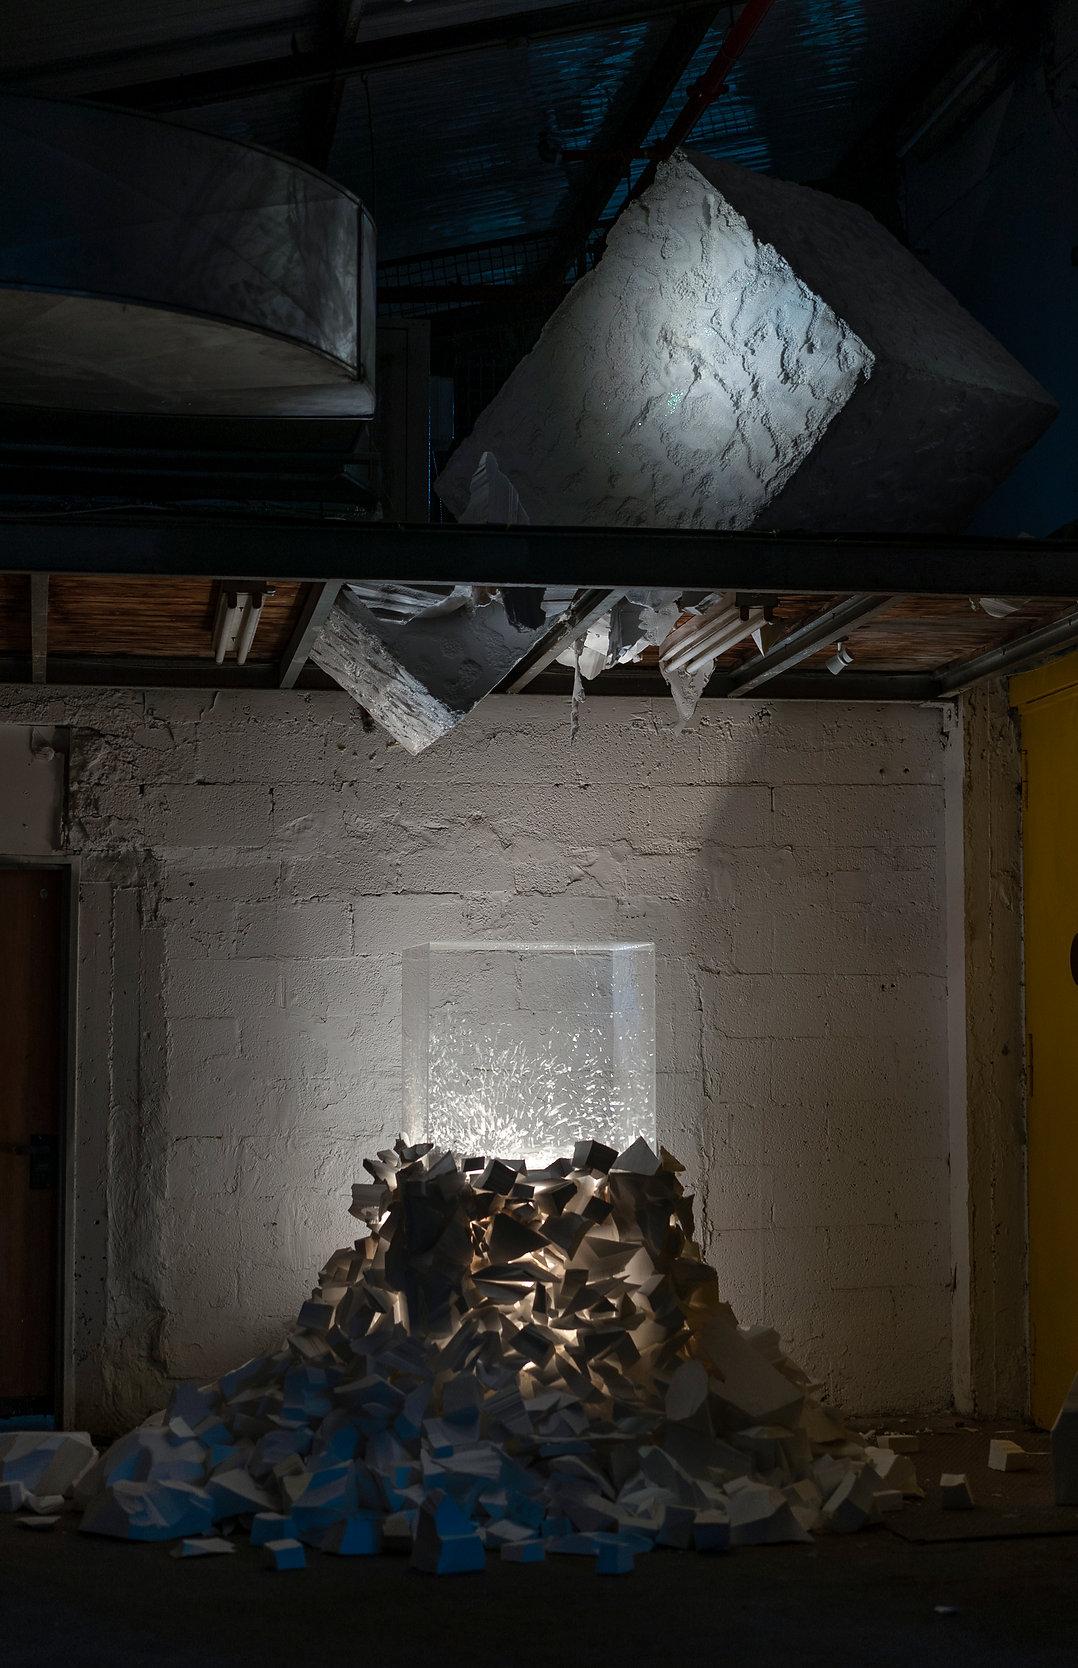 Elena Ceretti Stein Installation Exhibition contemporary art Hamekarer Gallery Mezeg Ra Bad Weather Temper Tel Aviv